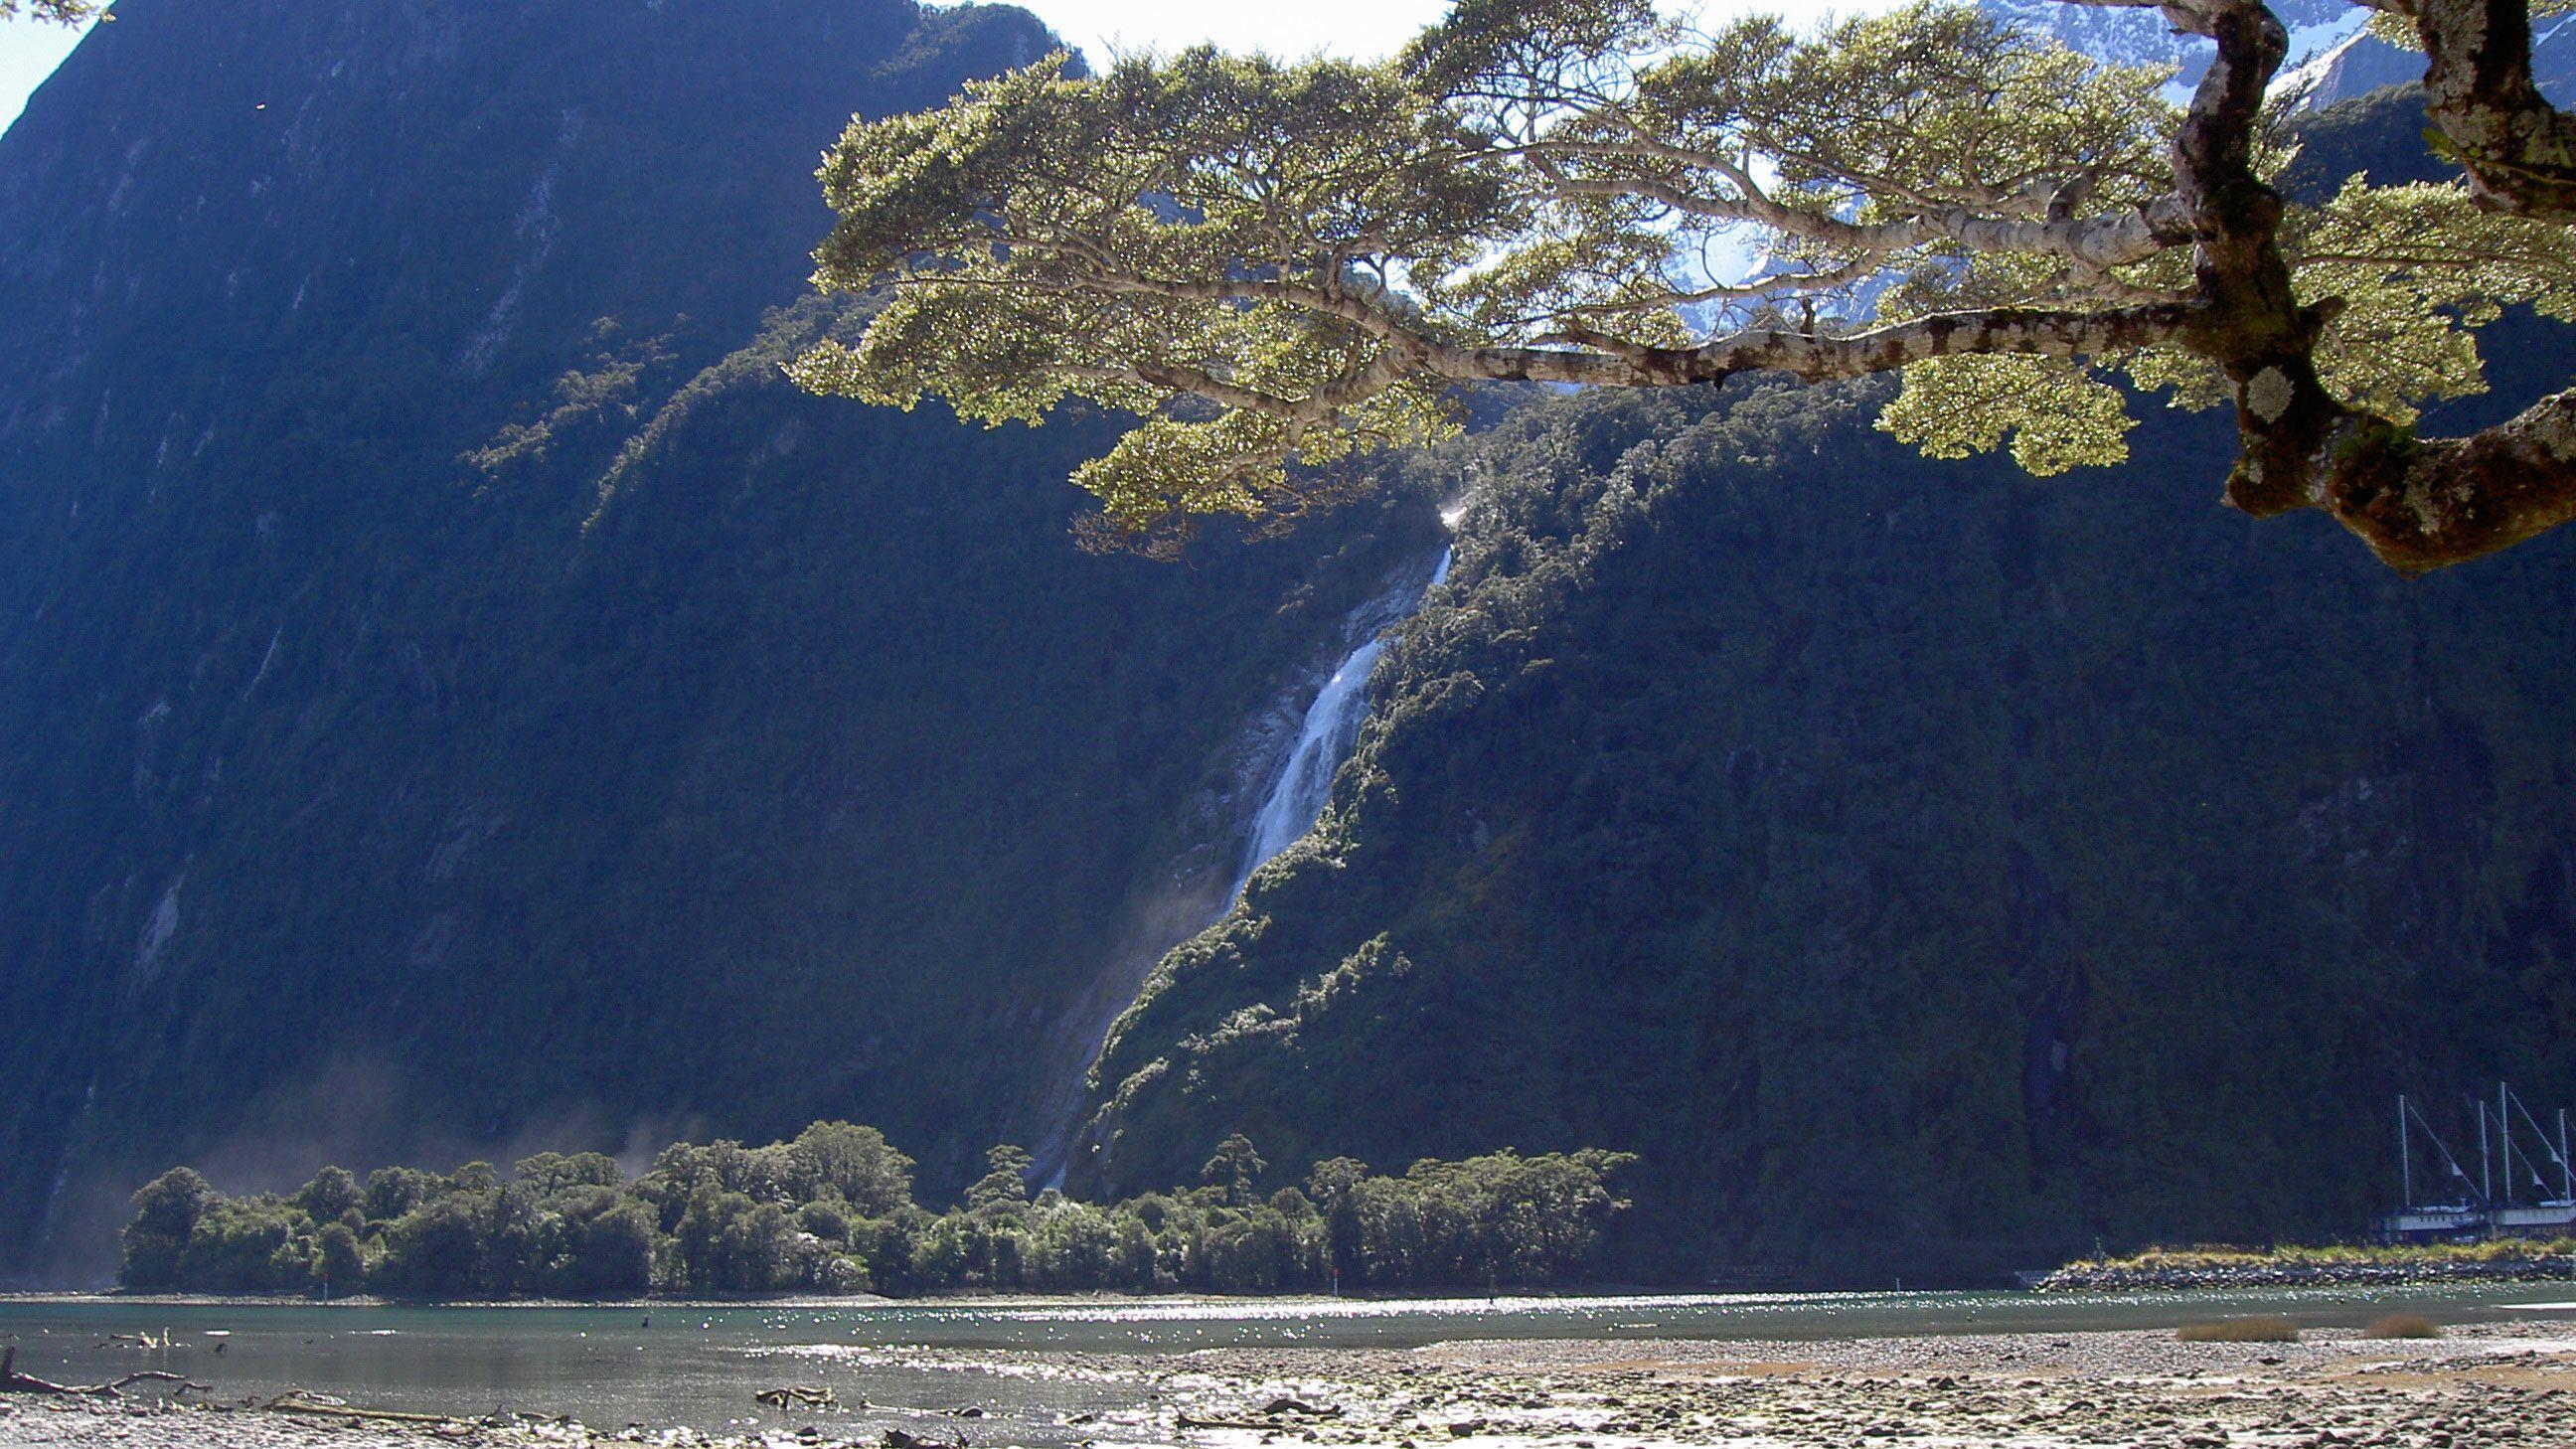 Mountain and tree next to a lake